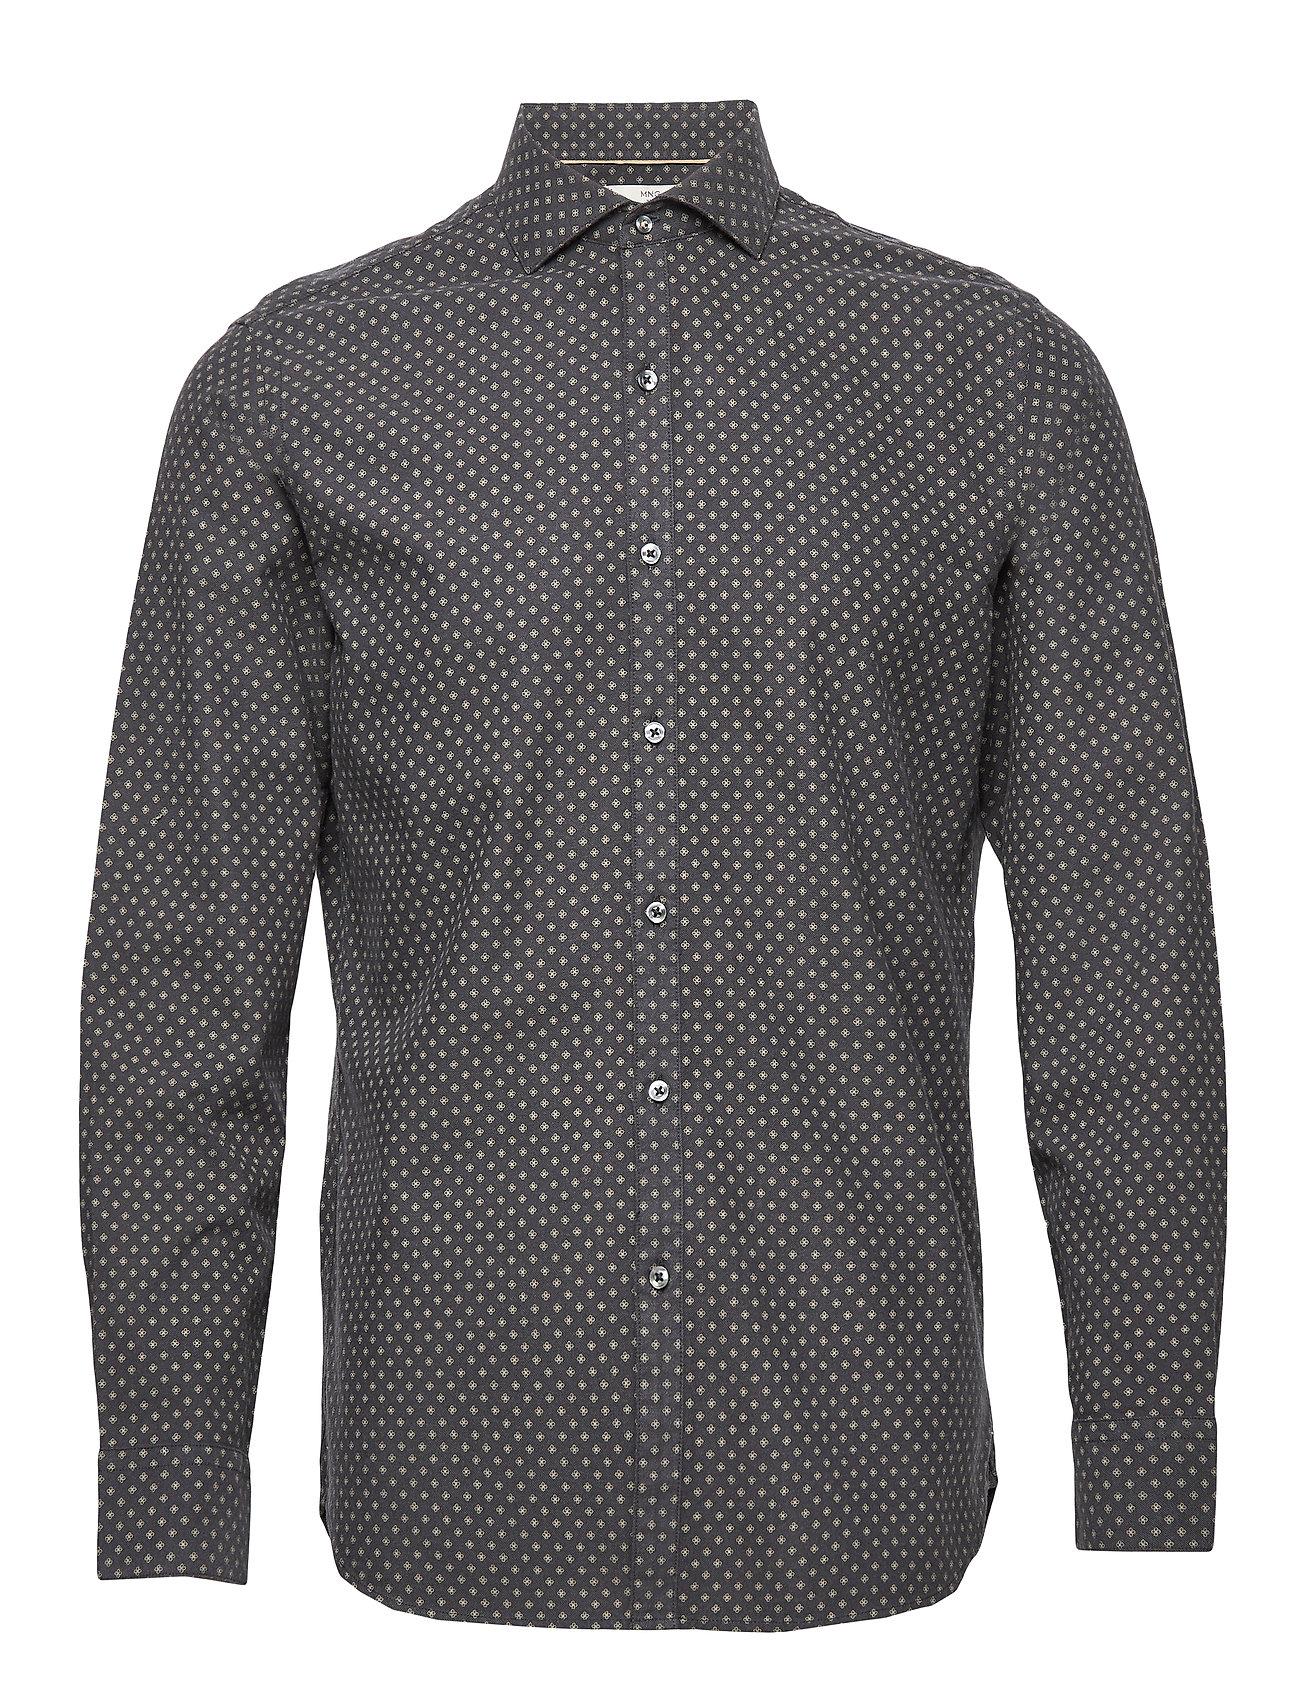 Mango Man Slim fit printed cotton shirt - DARK GREY